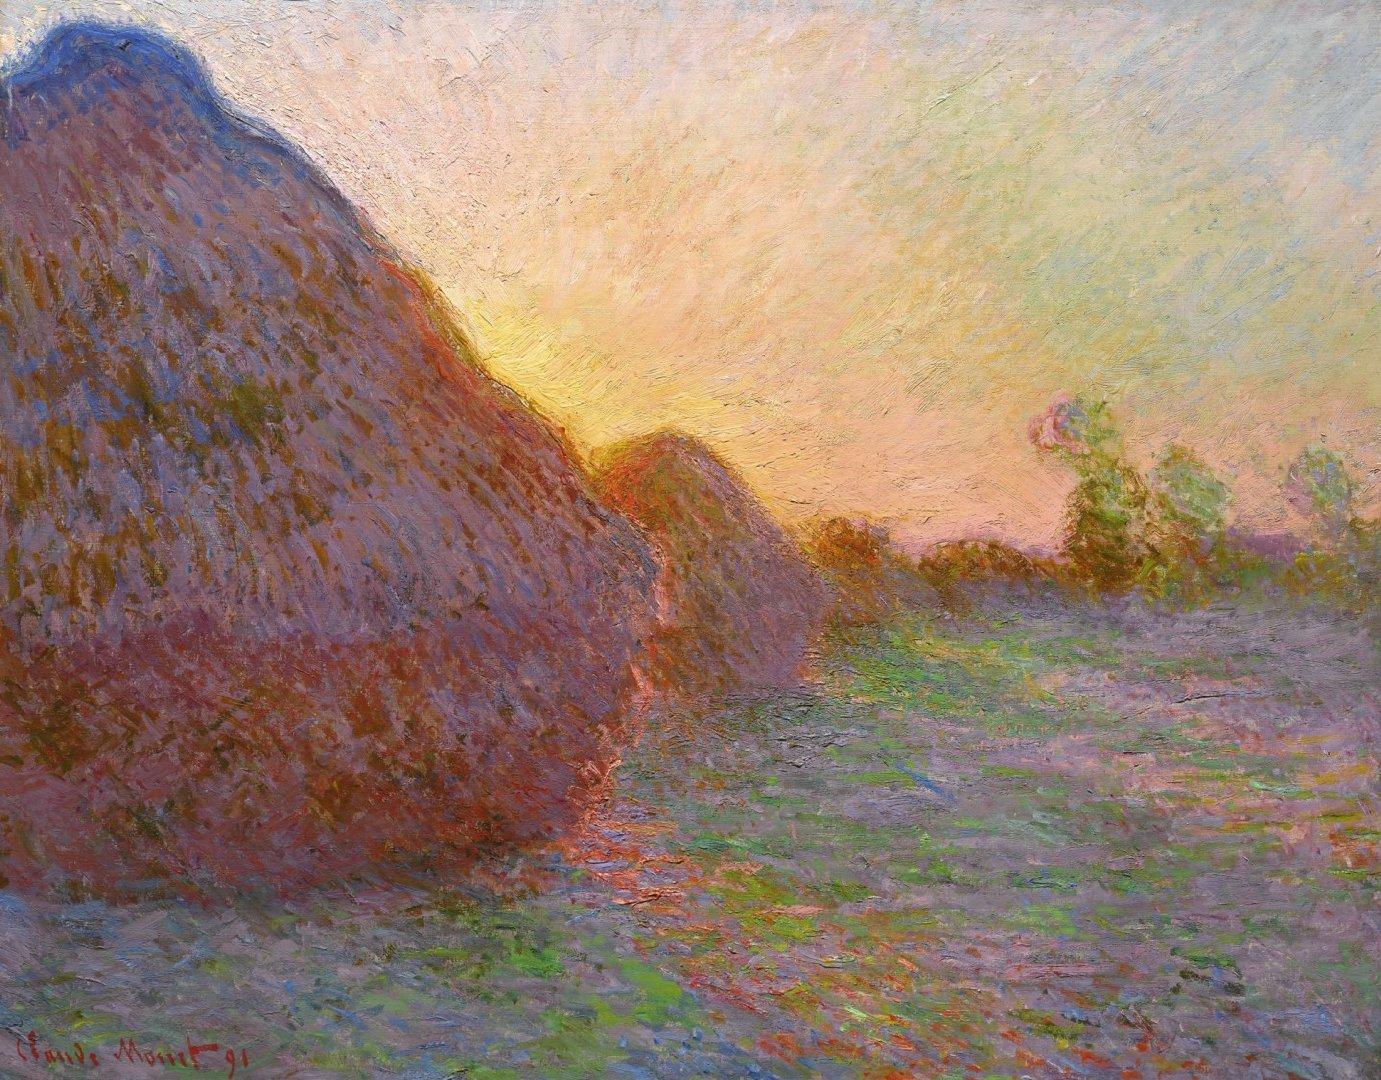 пейзаж < Стога сена >:: Клод Моне, описание картины - Моне Клод (Claude Monet) фото